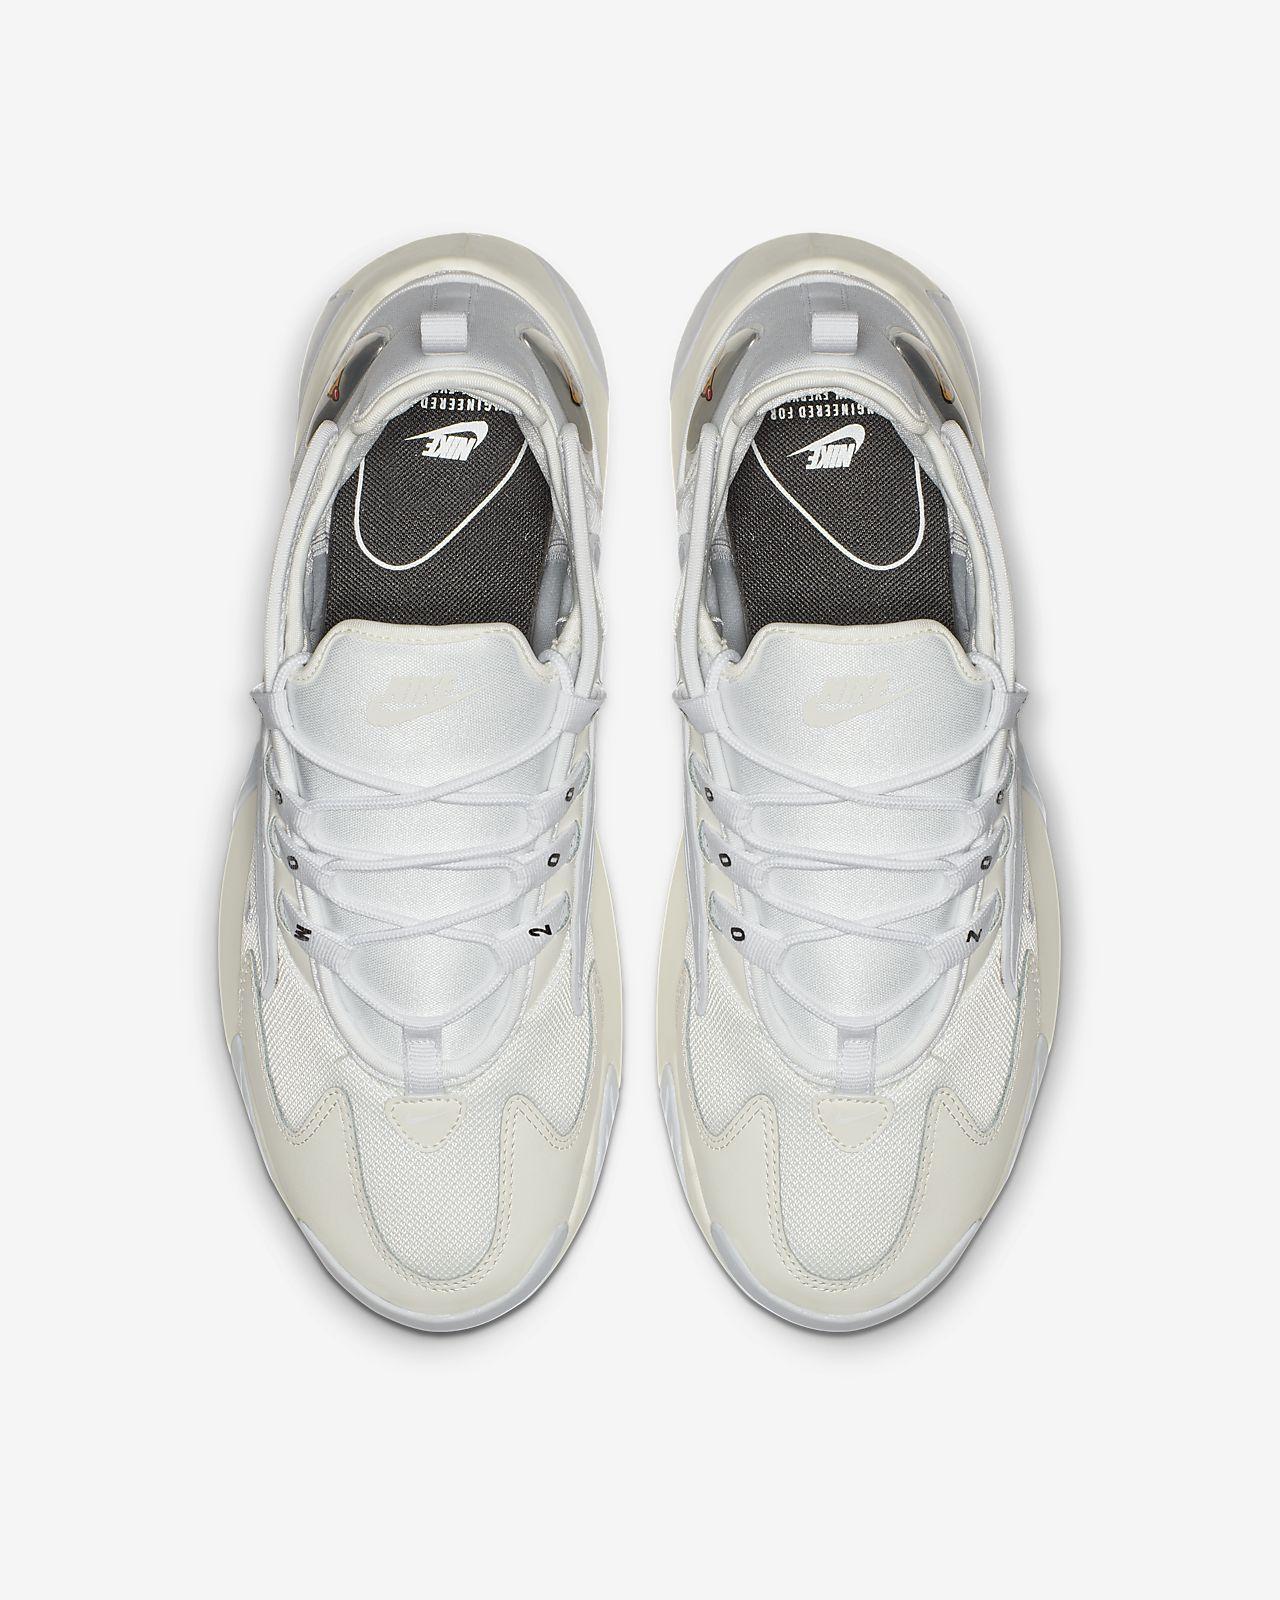 cheaper d0349 e0e1a ... Chaussure Nike Zoom 2K pour Homme